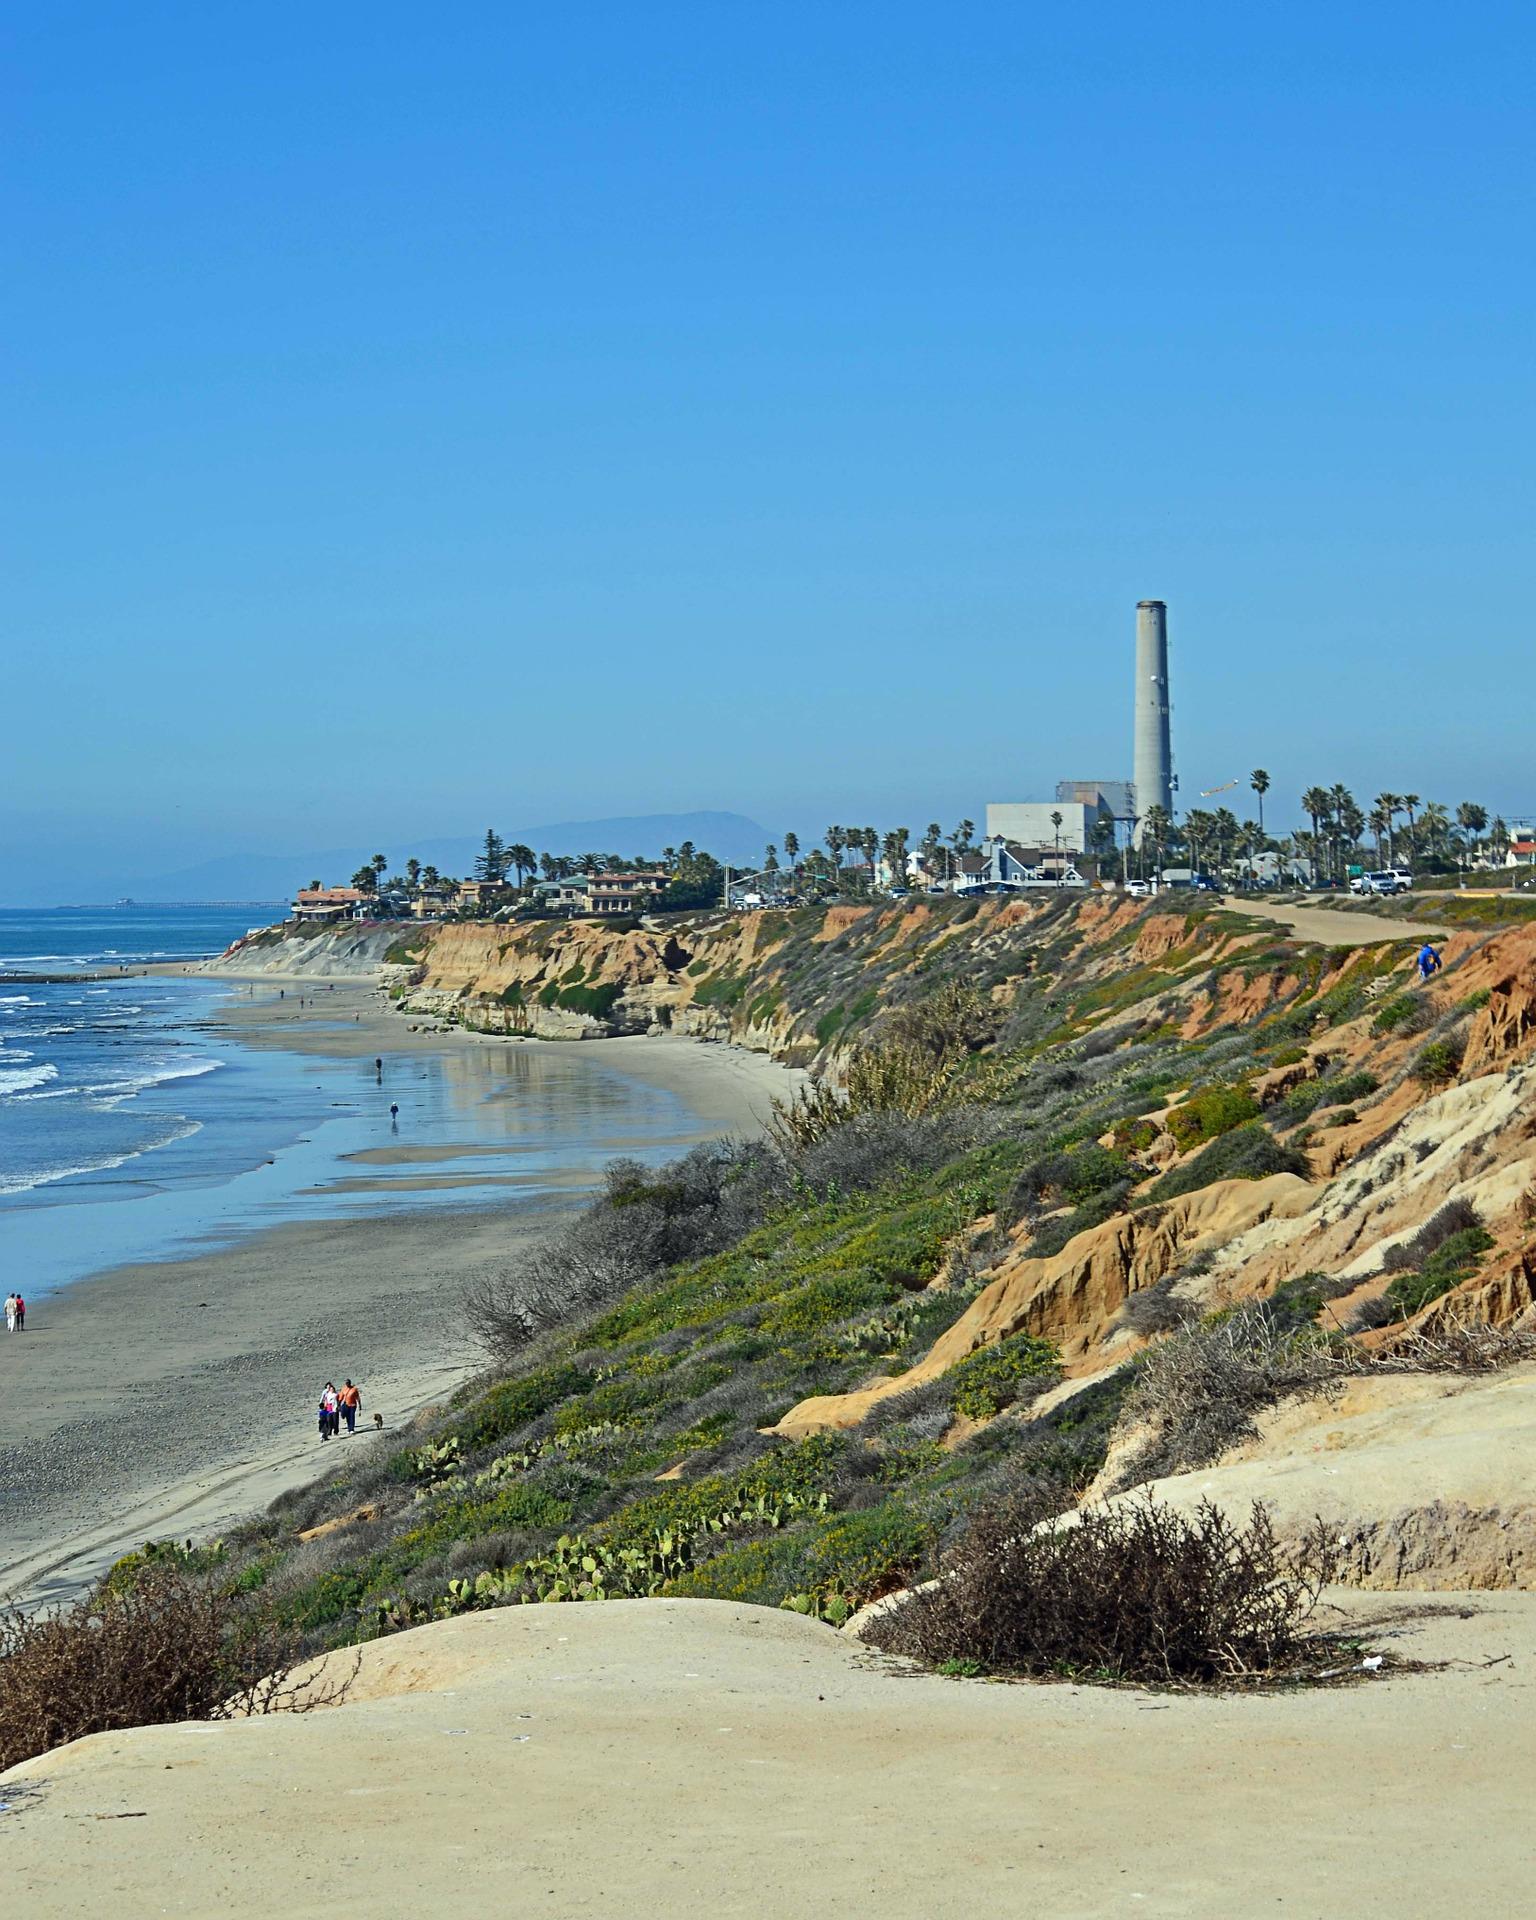 carlsbad california coast